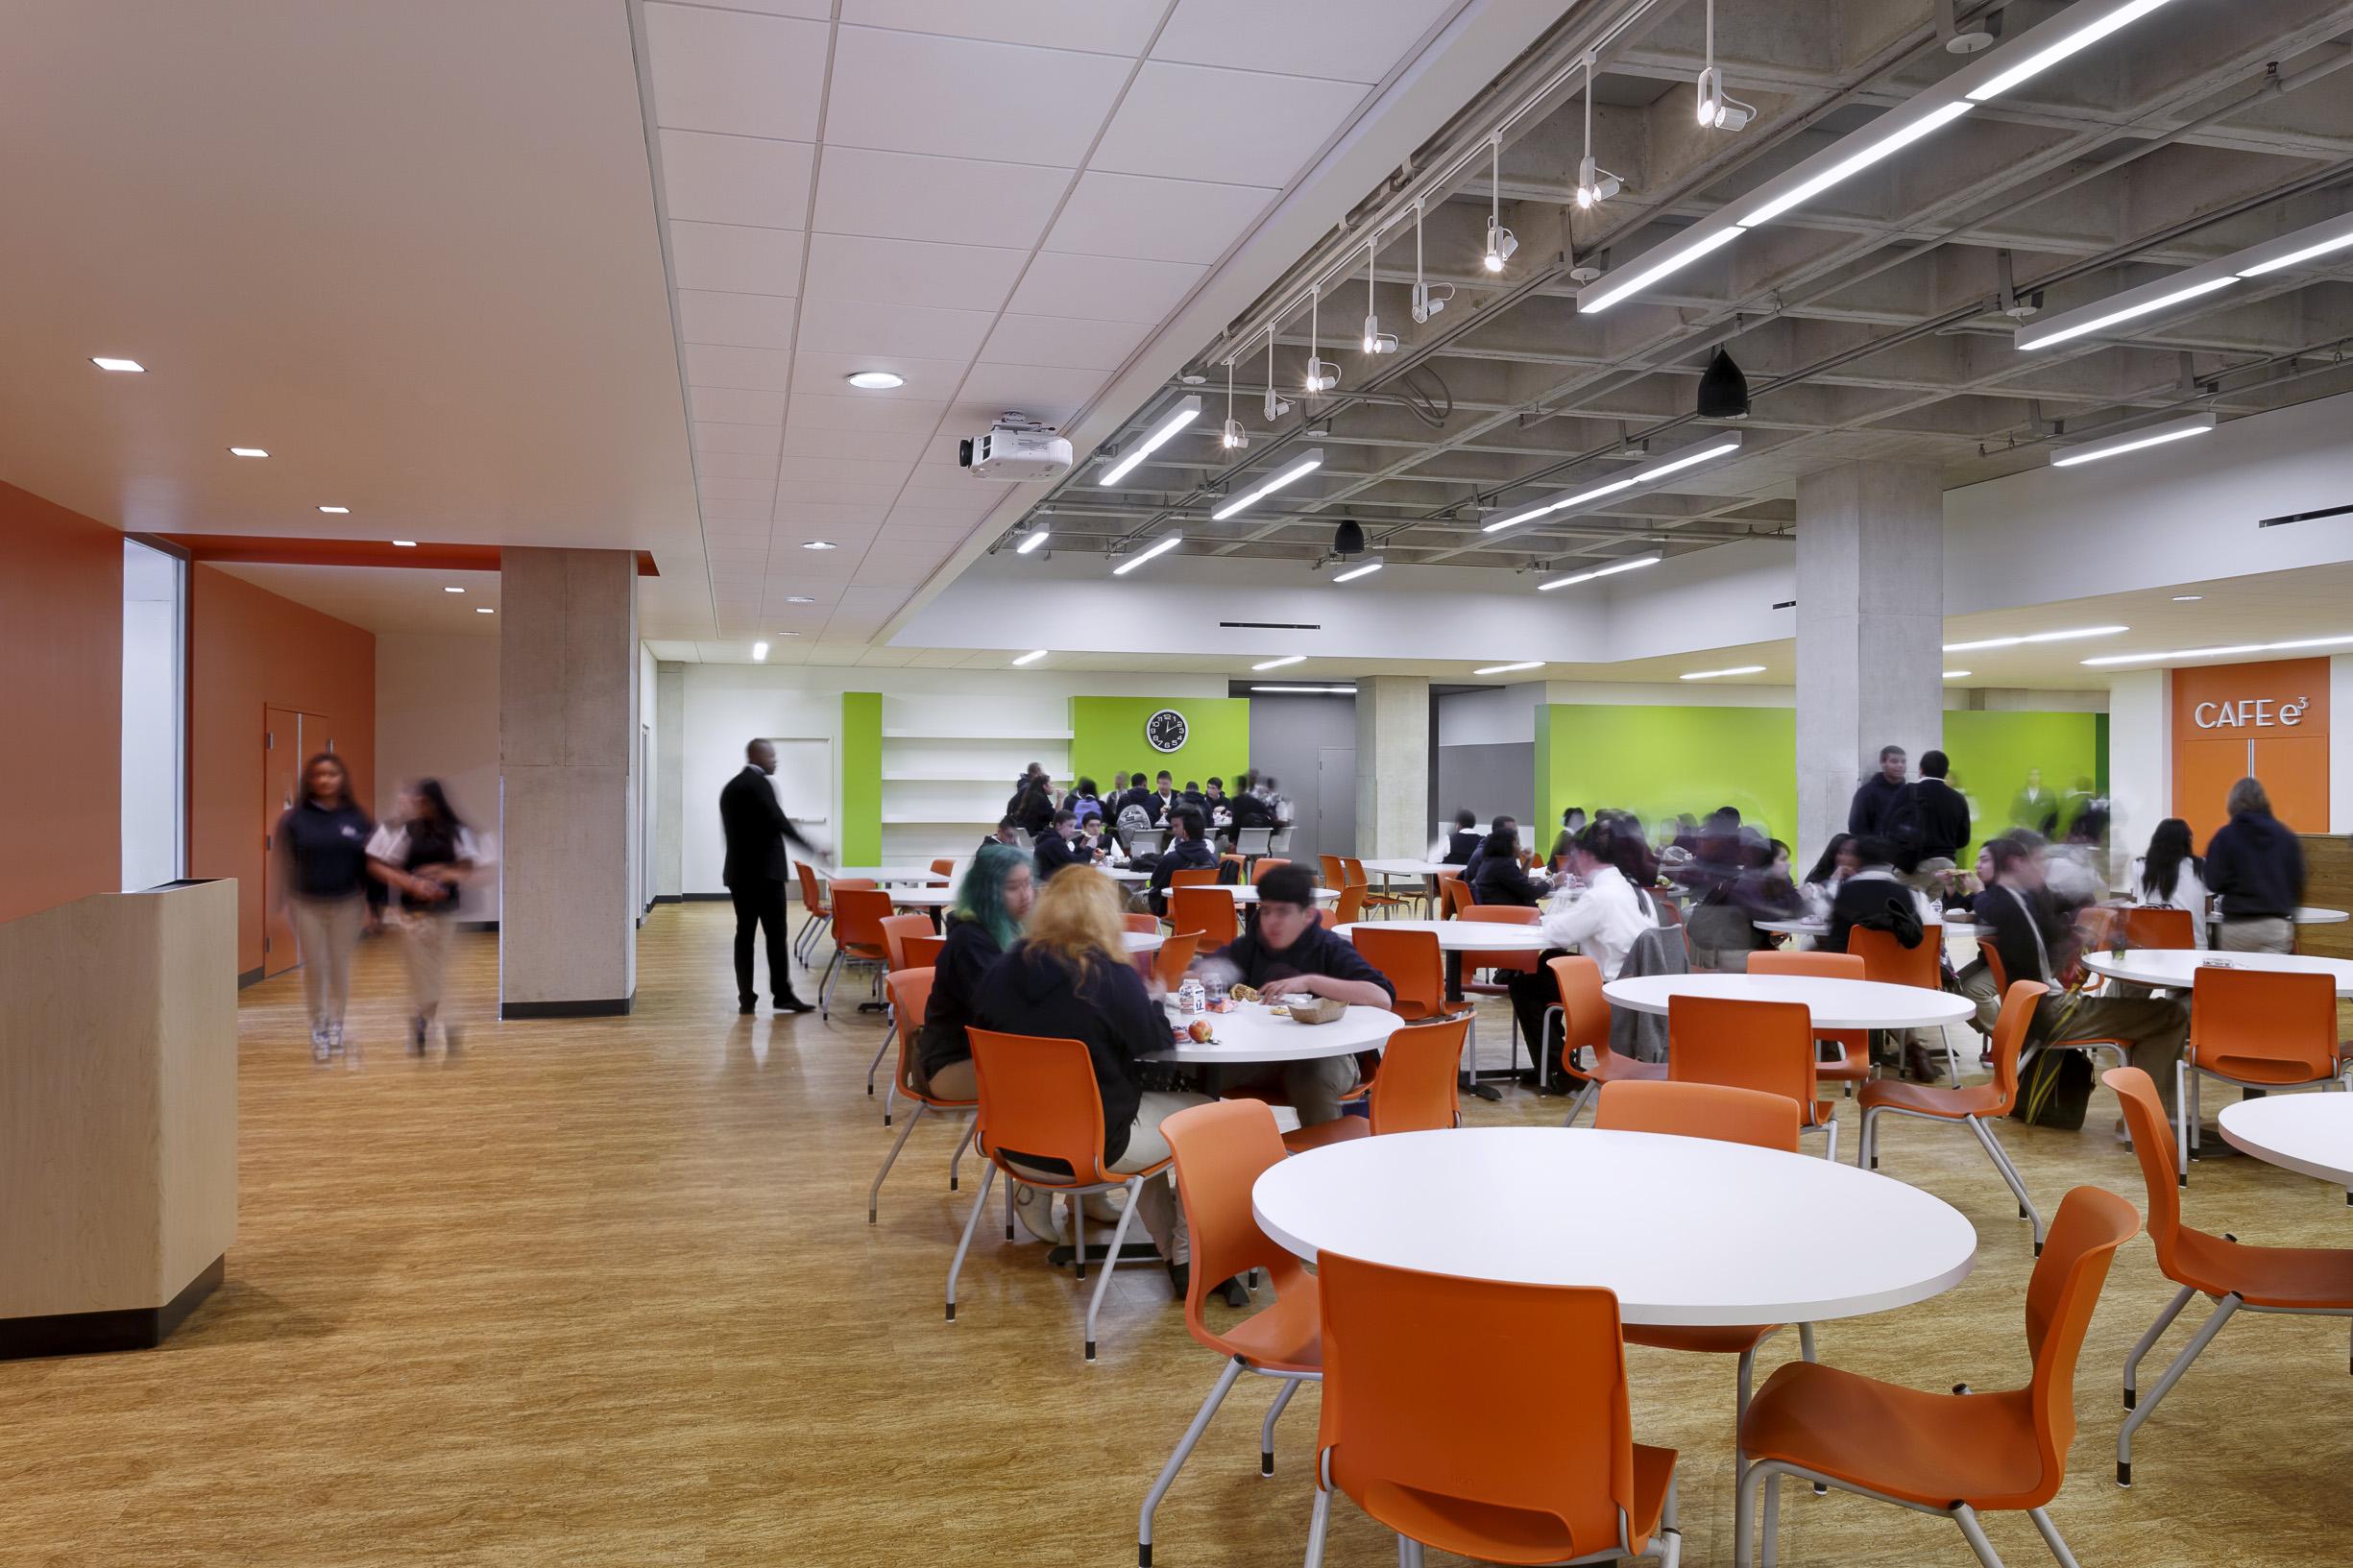 Classroom Design Collaborative Learning ~ Lpa inc receives honor for cutting edge k school design